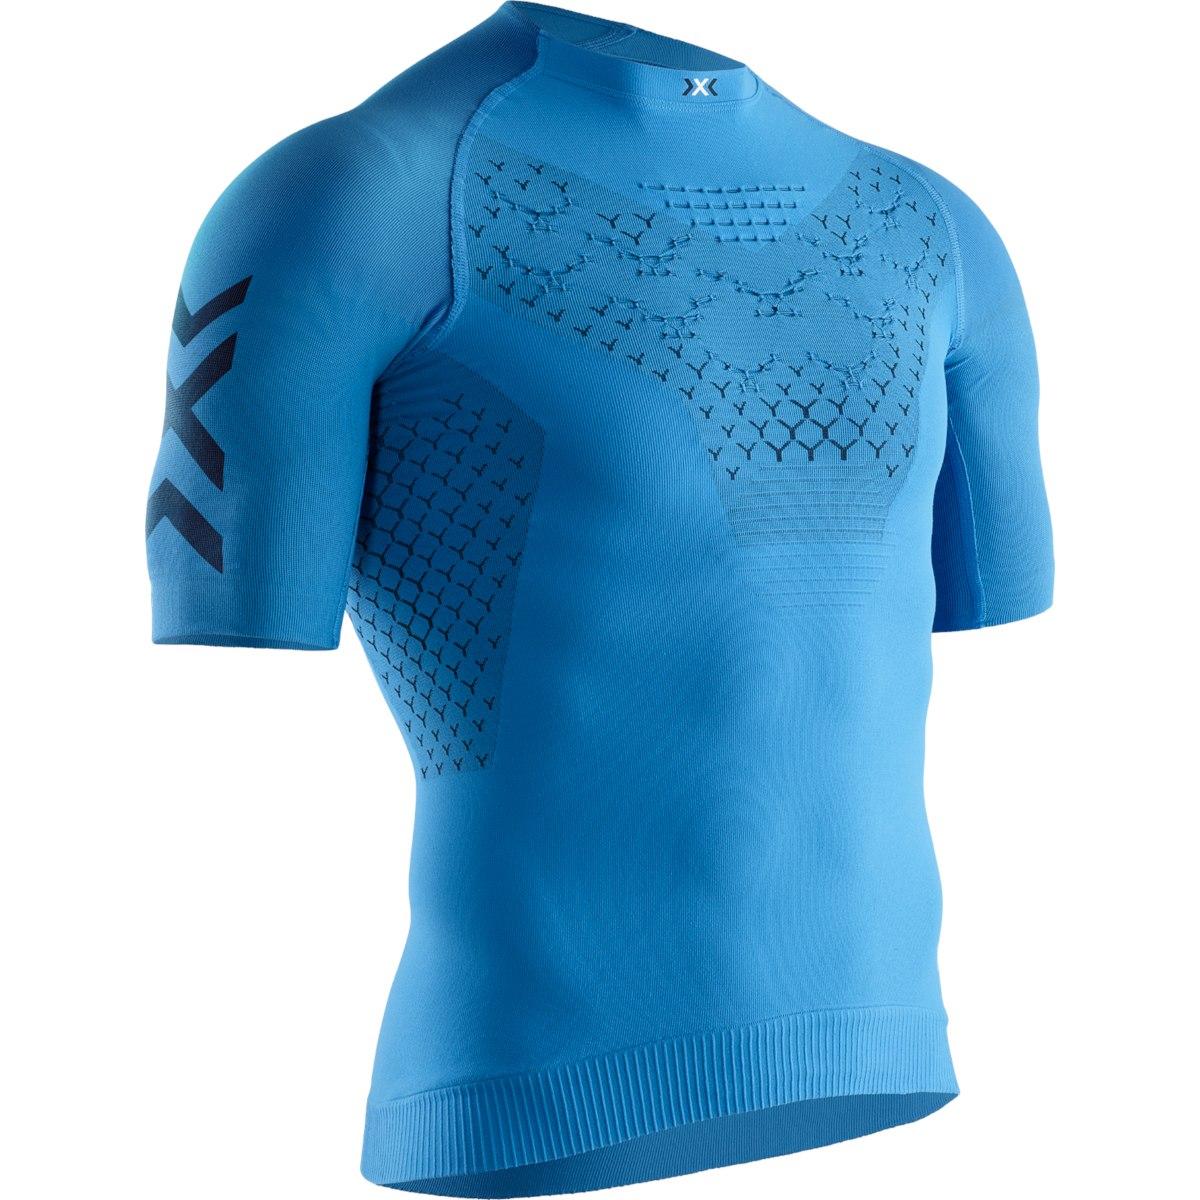 X-Bionic TWYCE 4.0 Run Shirt Short Sleeves for Men - twyce blue/opal black